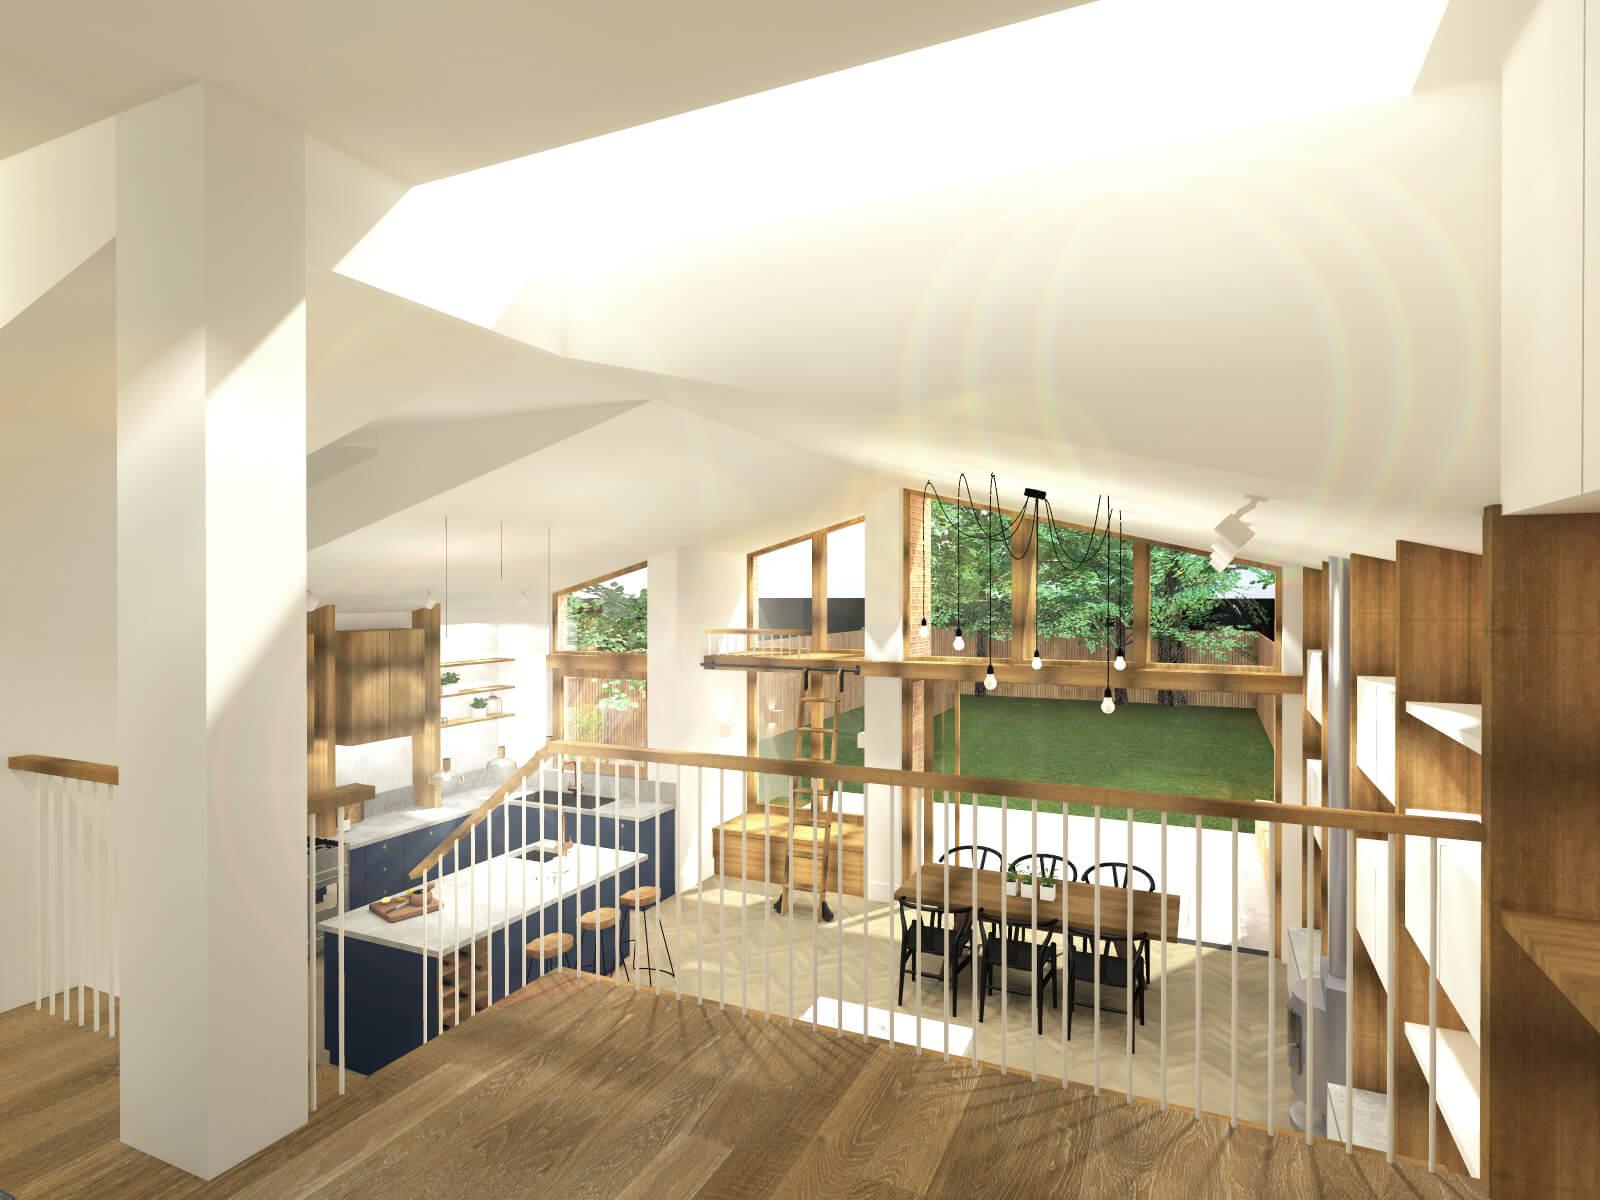 Interior View 2